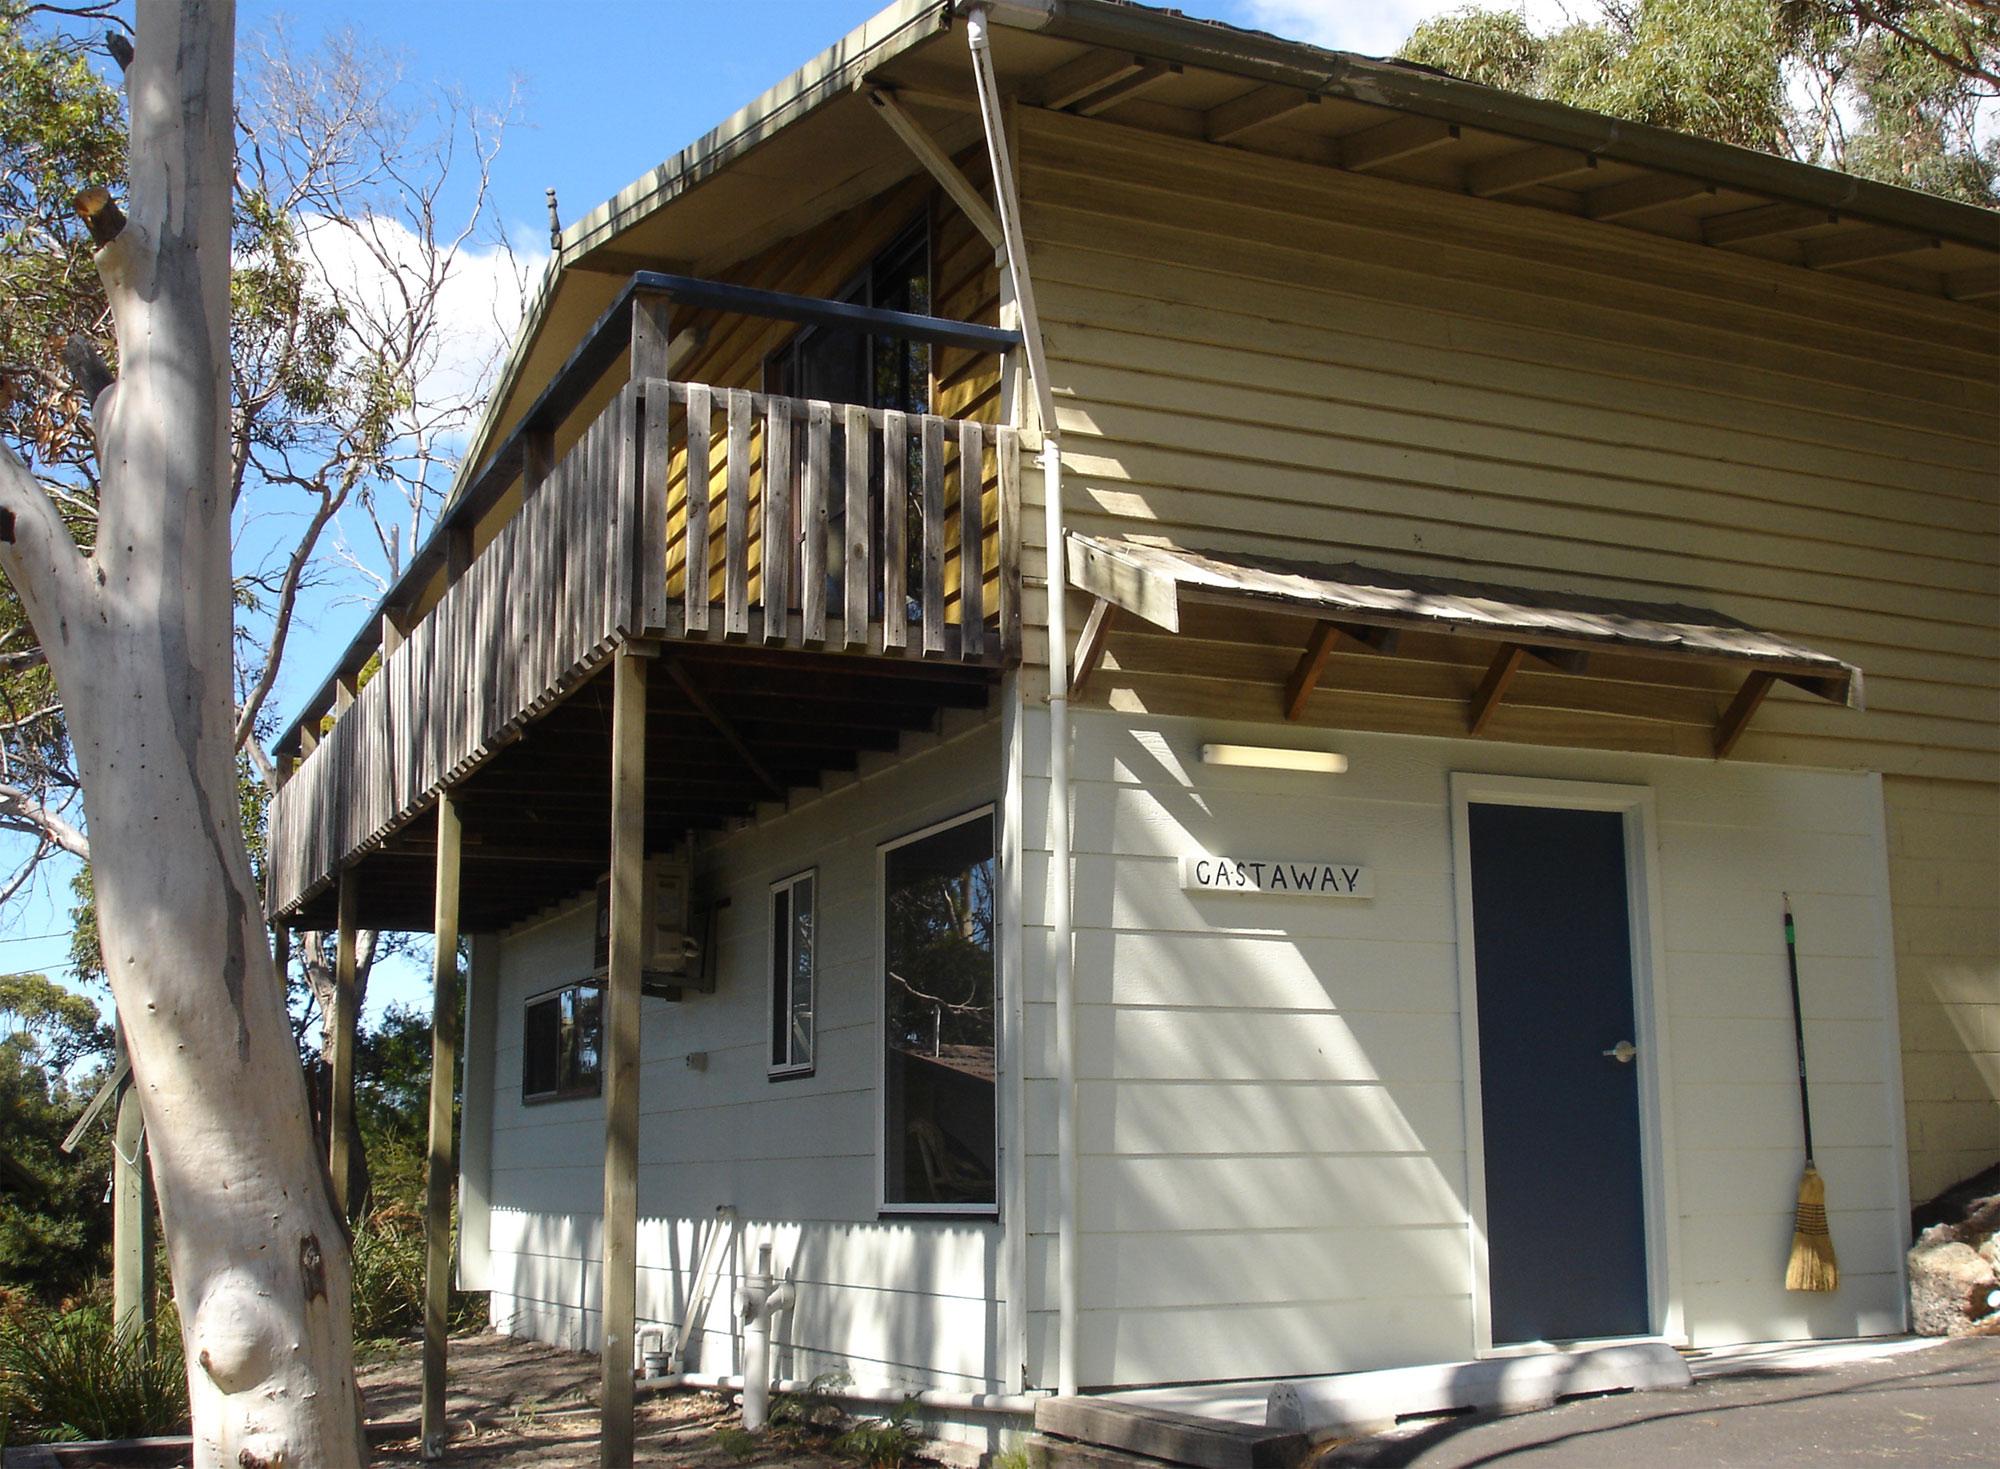 3 Bedroom accommodation Bicheno East Coast Tasmania